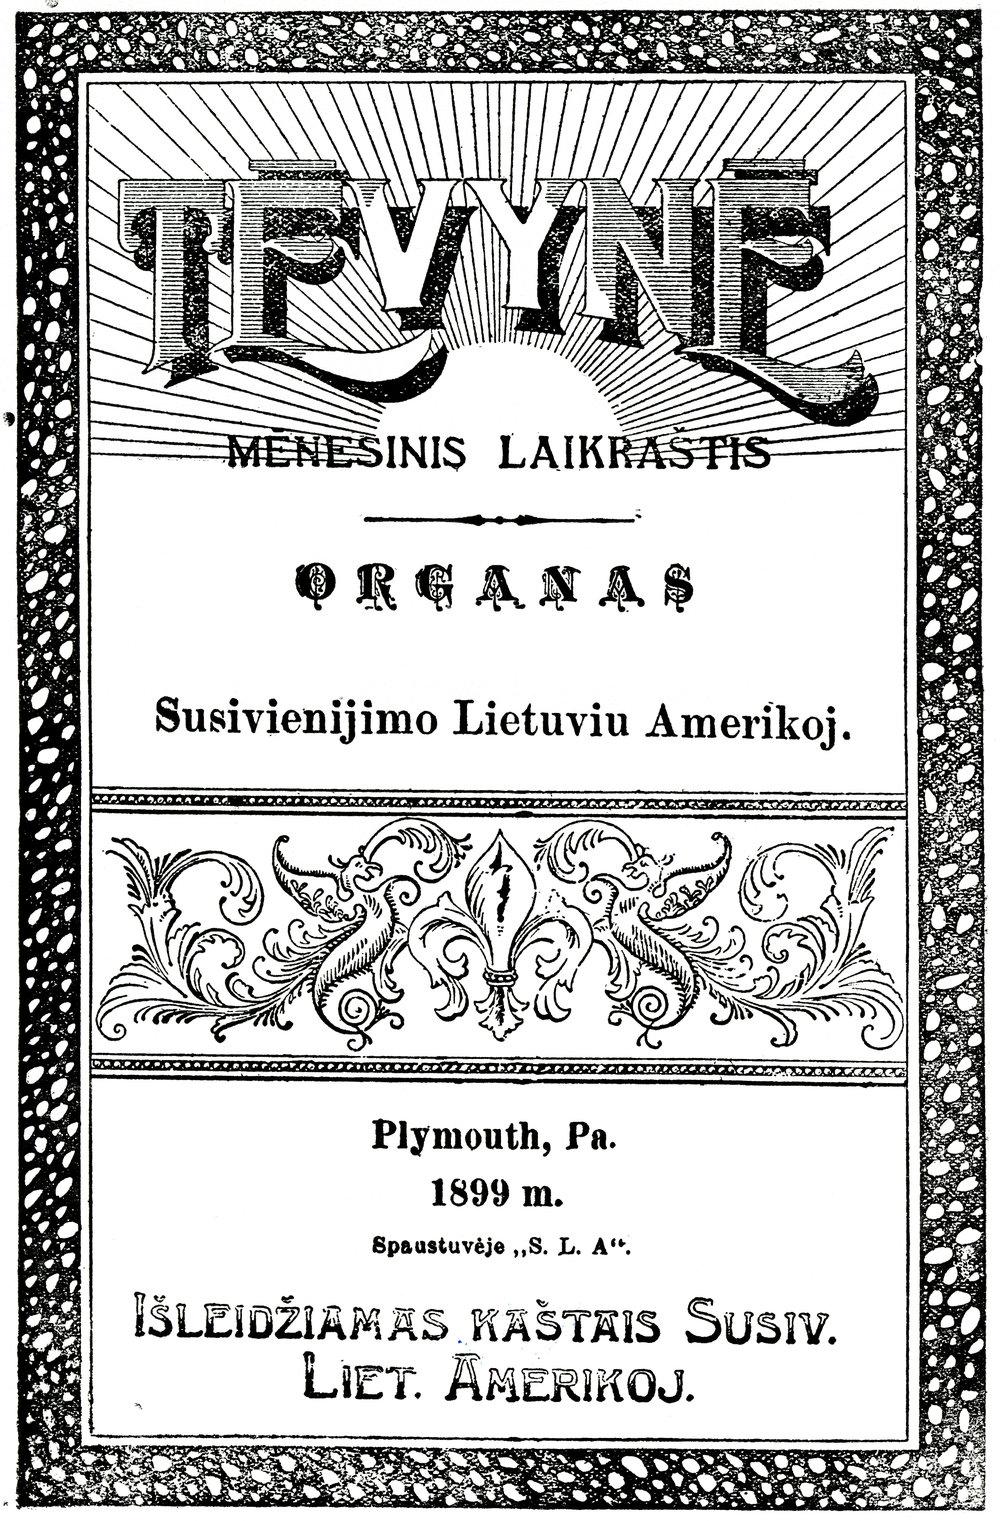 Tėvynė laikraščio egzempliorius, 1899m. Plymouth, Pa S.L.A Spaustuvė   /    Tėvynė periodical,  1899 Plymouth, Pa S.L.A printing-house